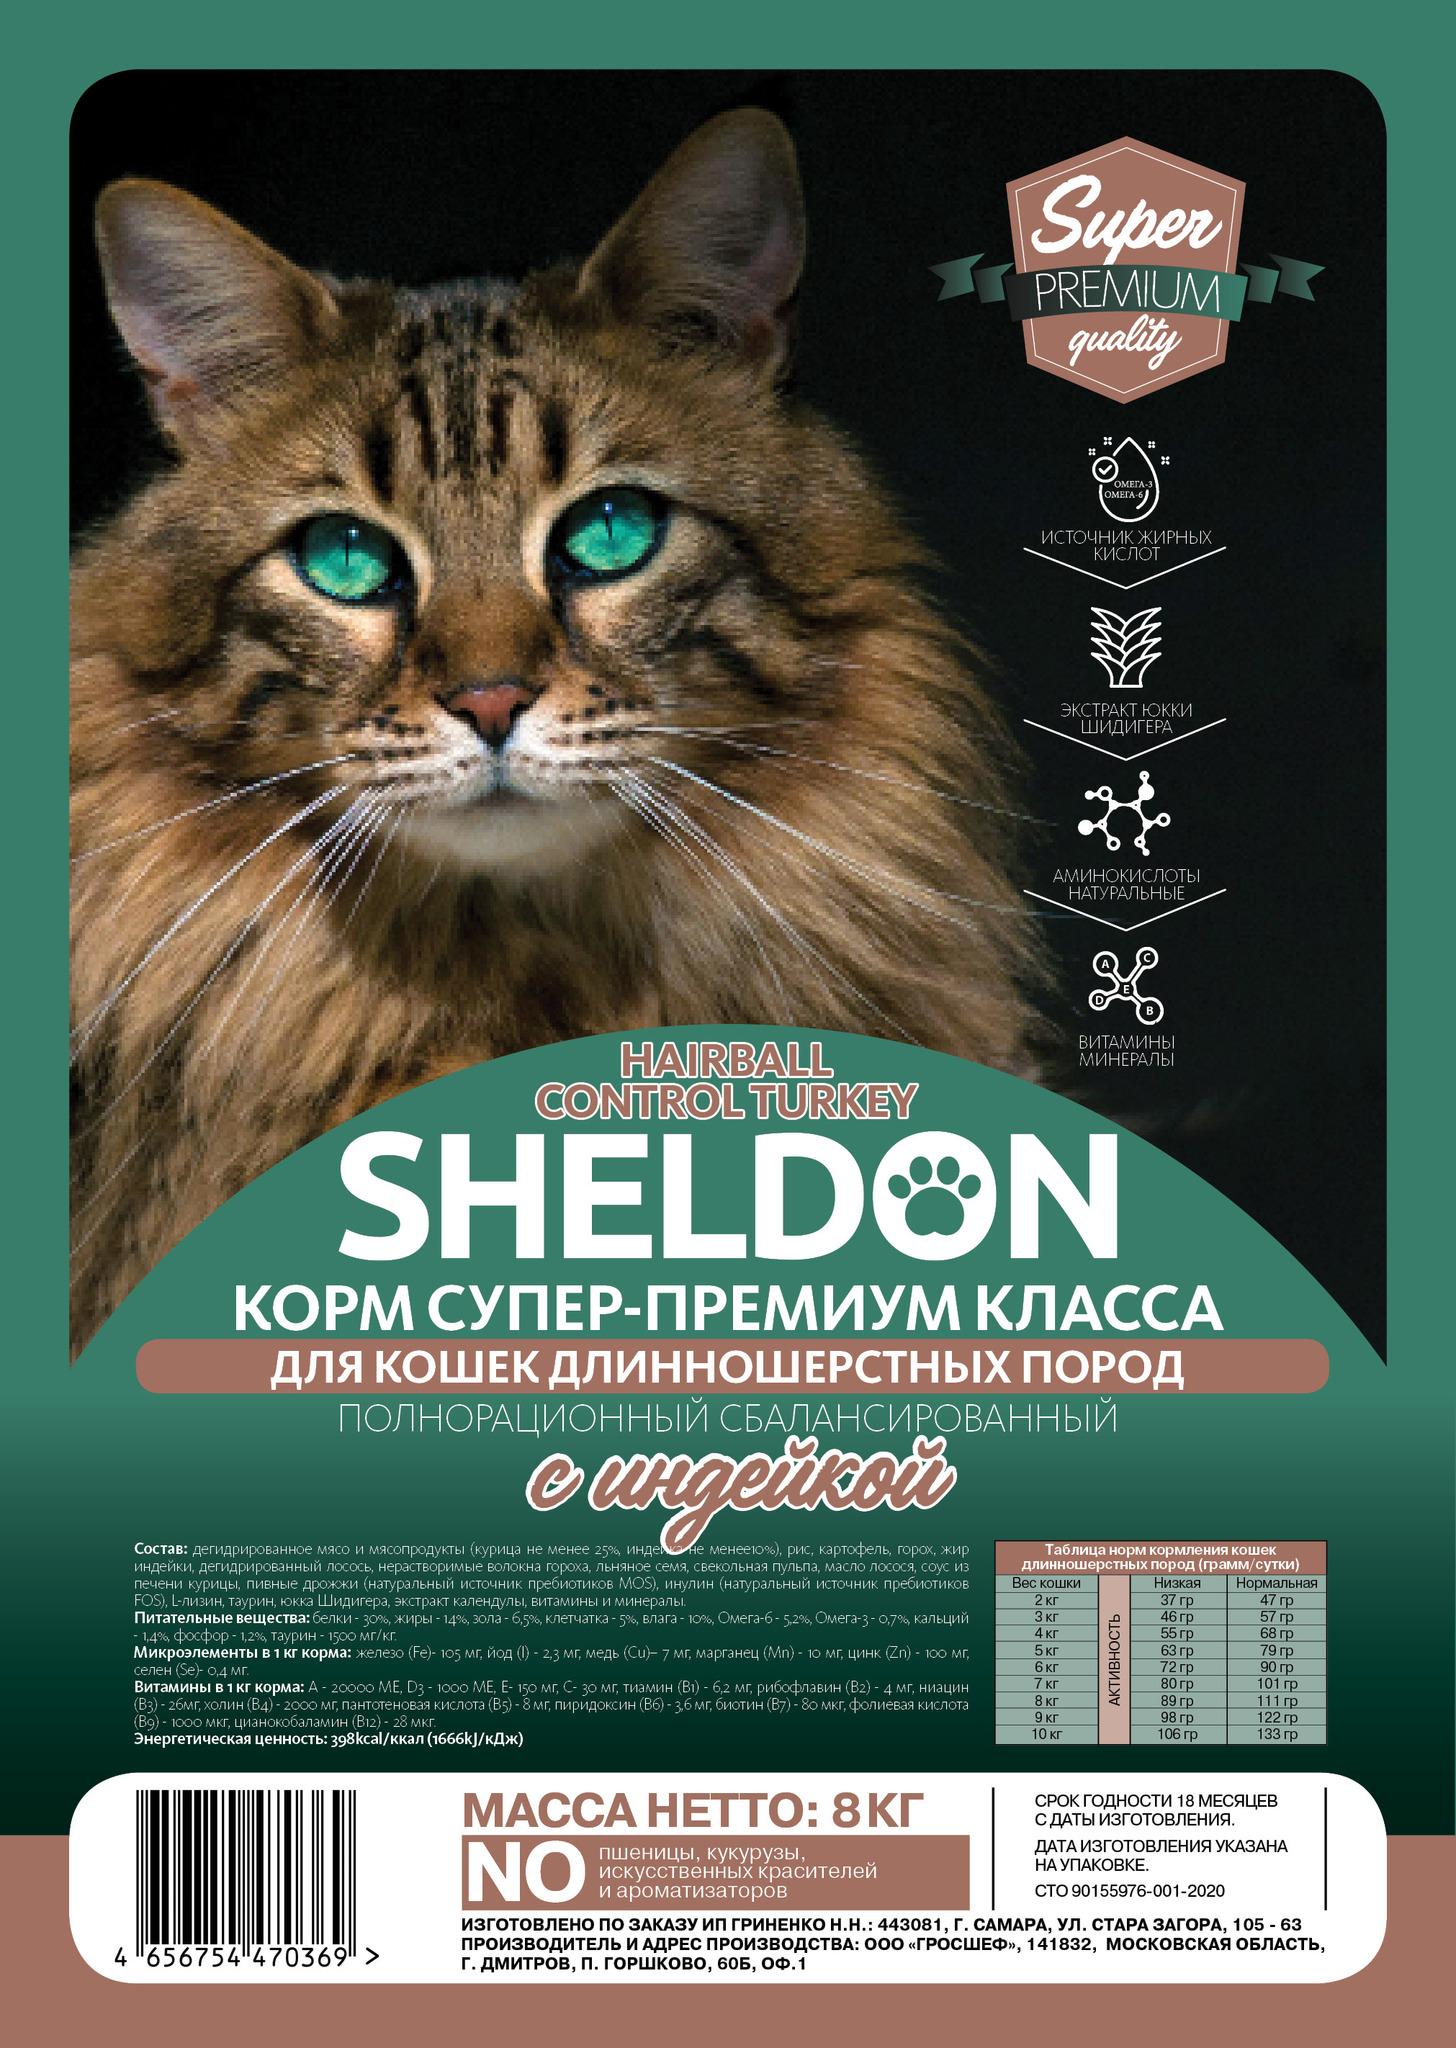 Сухой корм Корм для длинношерстных кошек  Sheldon Hairball Control Turkey Super Premium, с индейкой Шелдон_А4_4-1.jpg